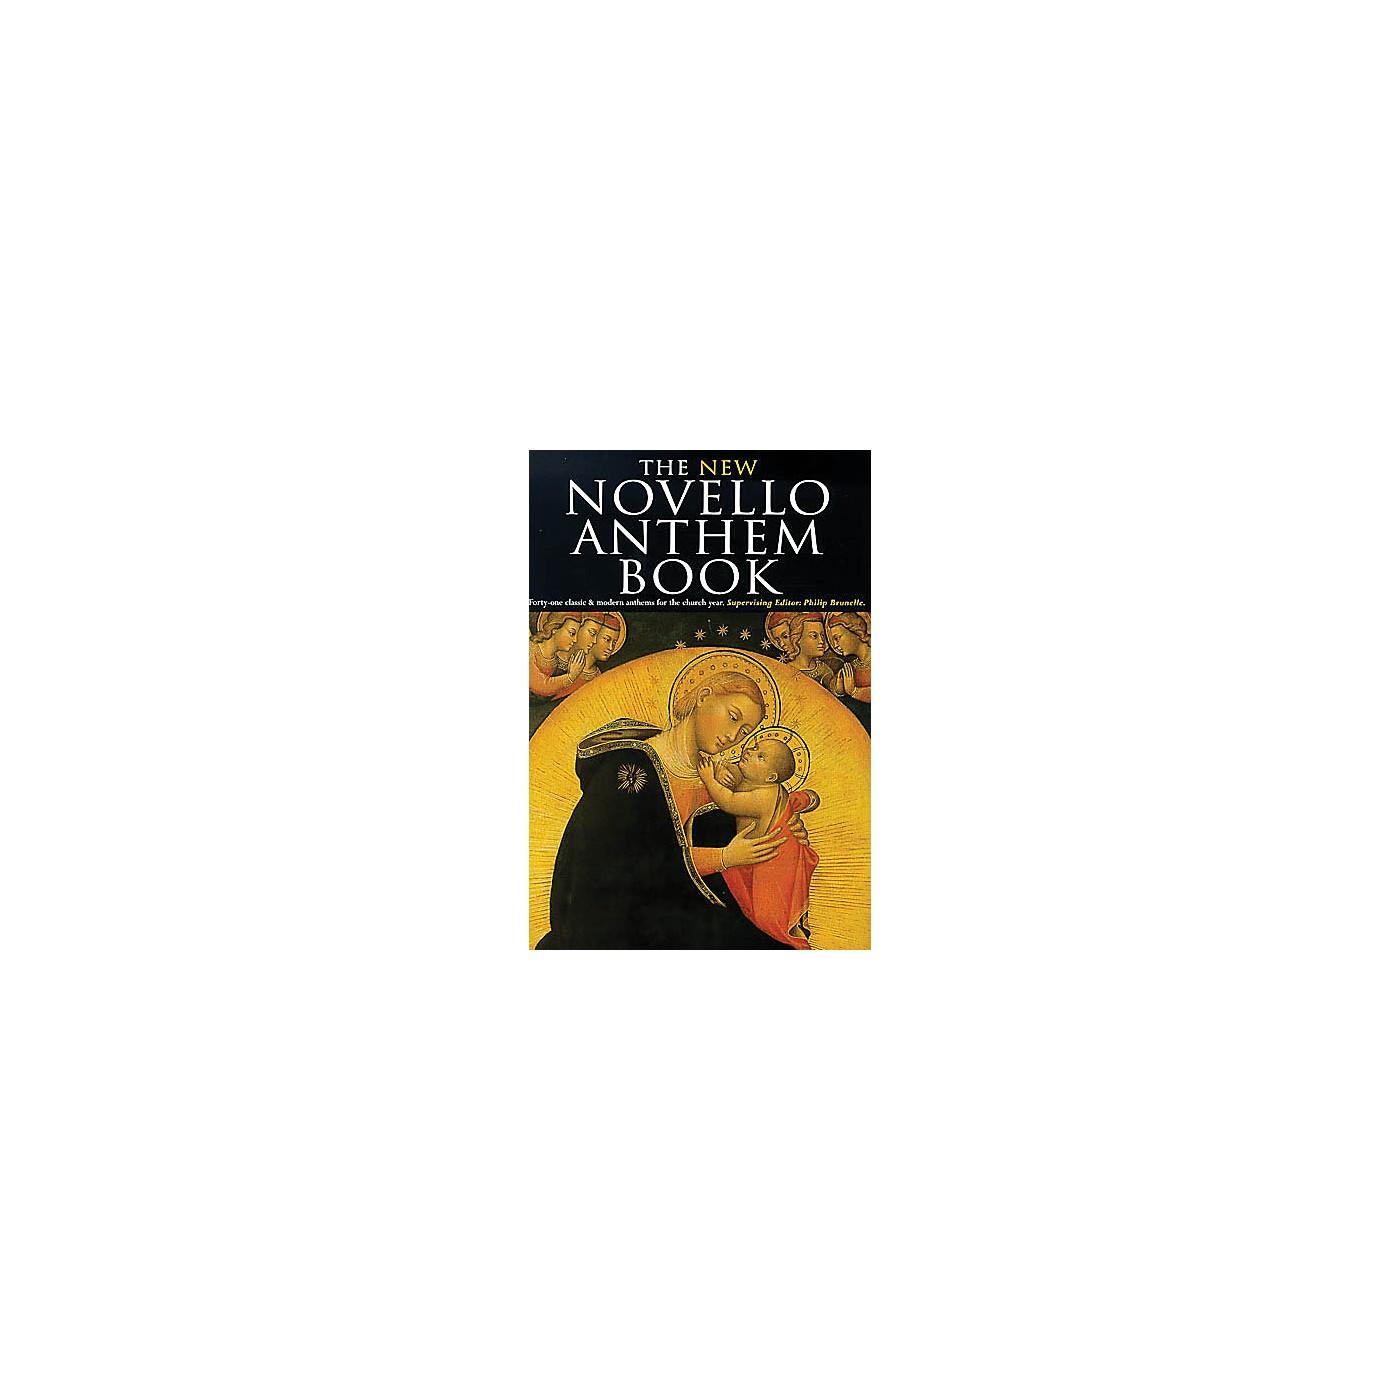 Novello The New Novello Anthem Book SATB thumbnail